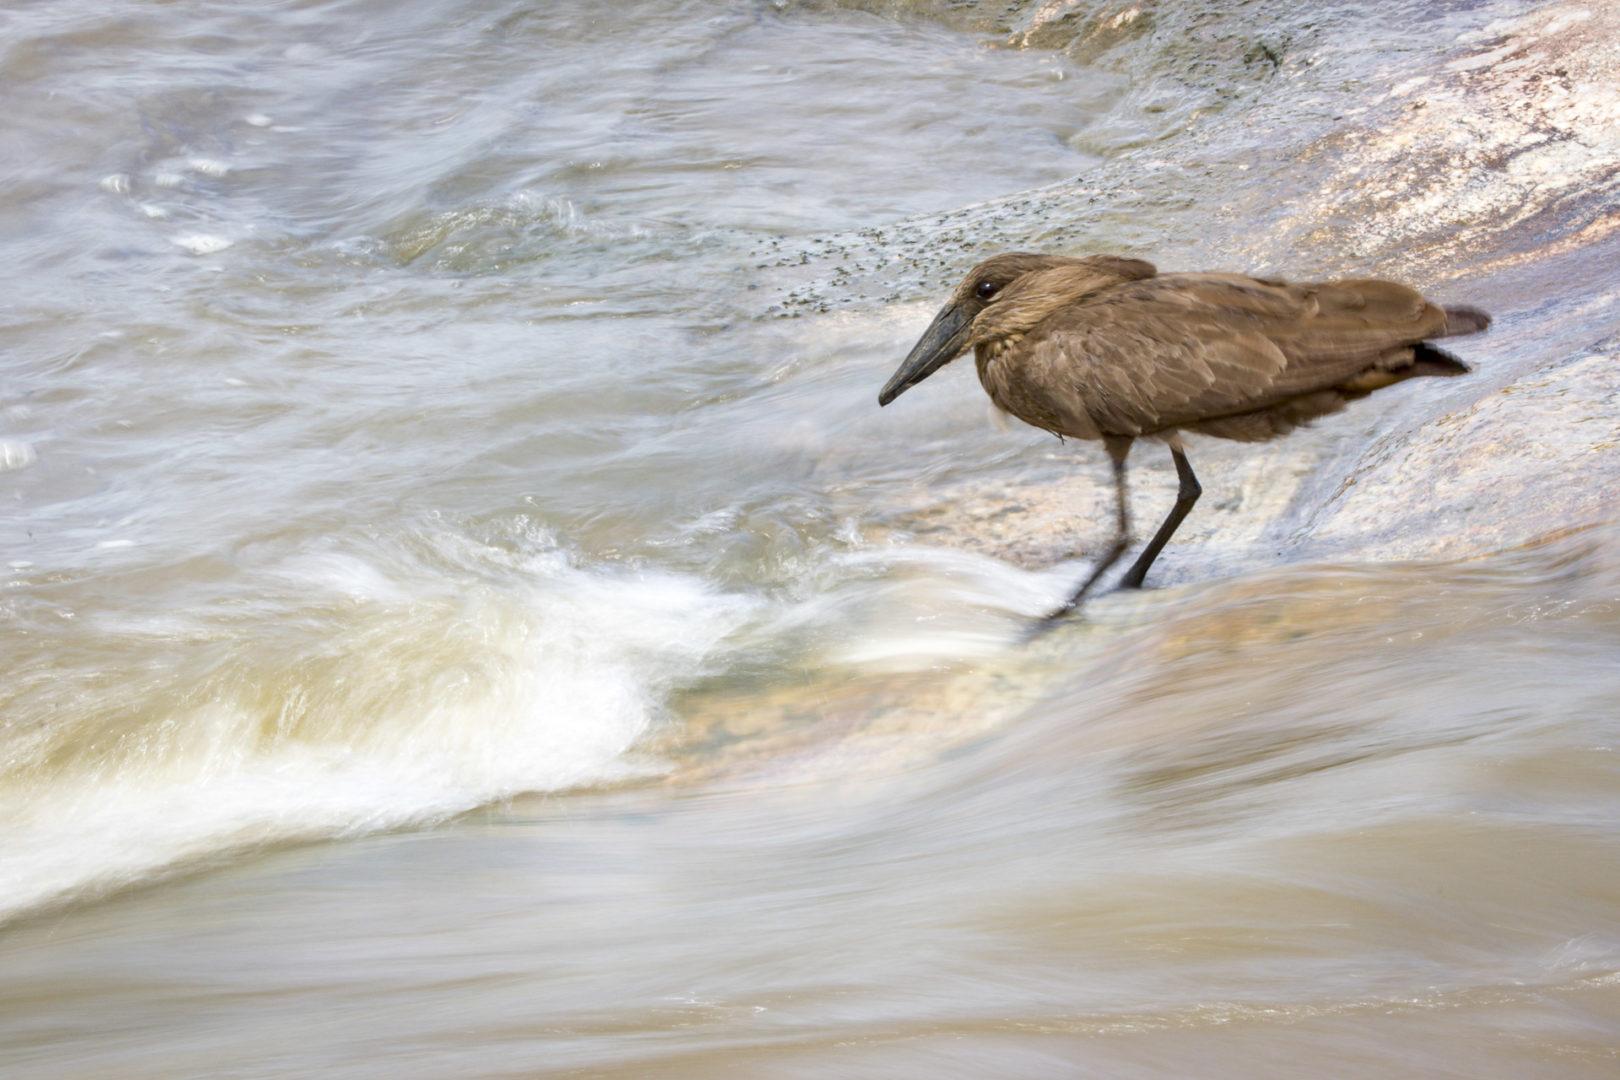 Skukuza Safari Lodge and Private Safari image oga hammerkop next to slow motion water